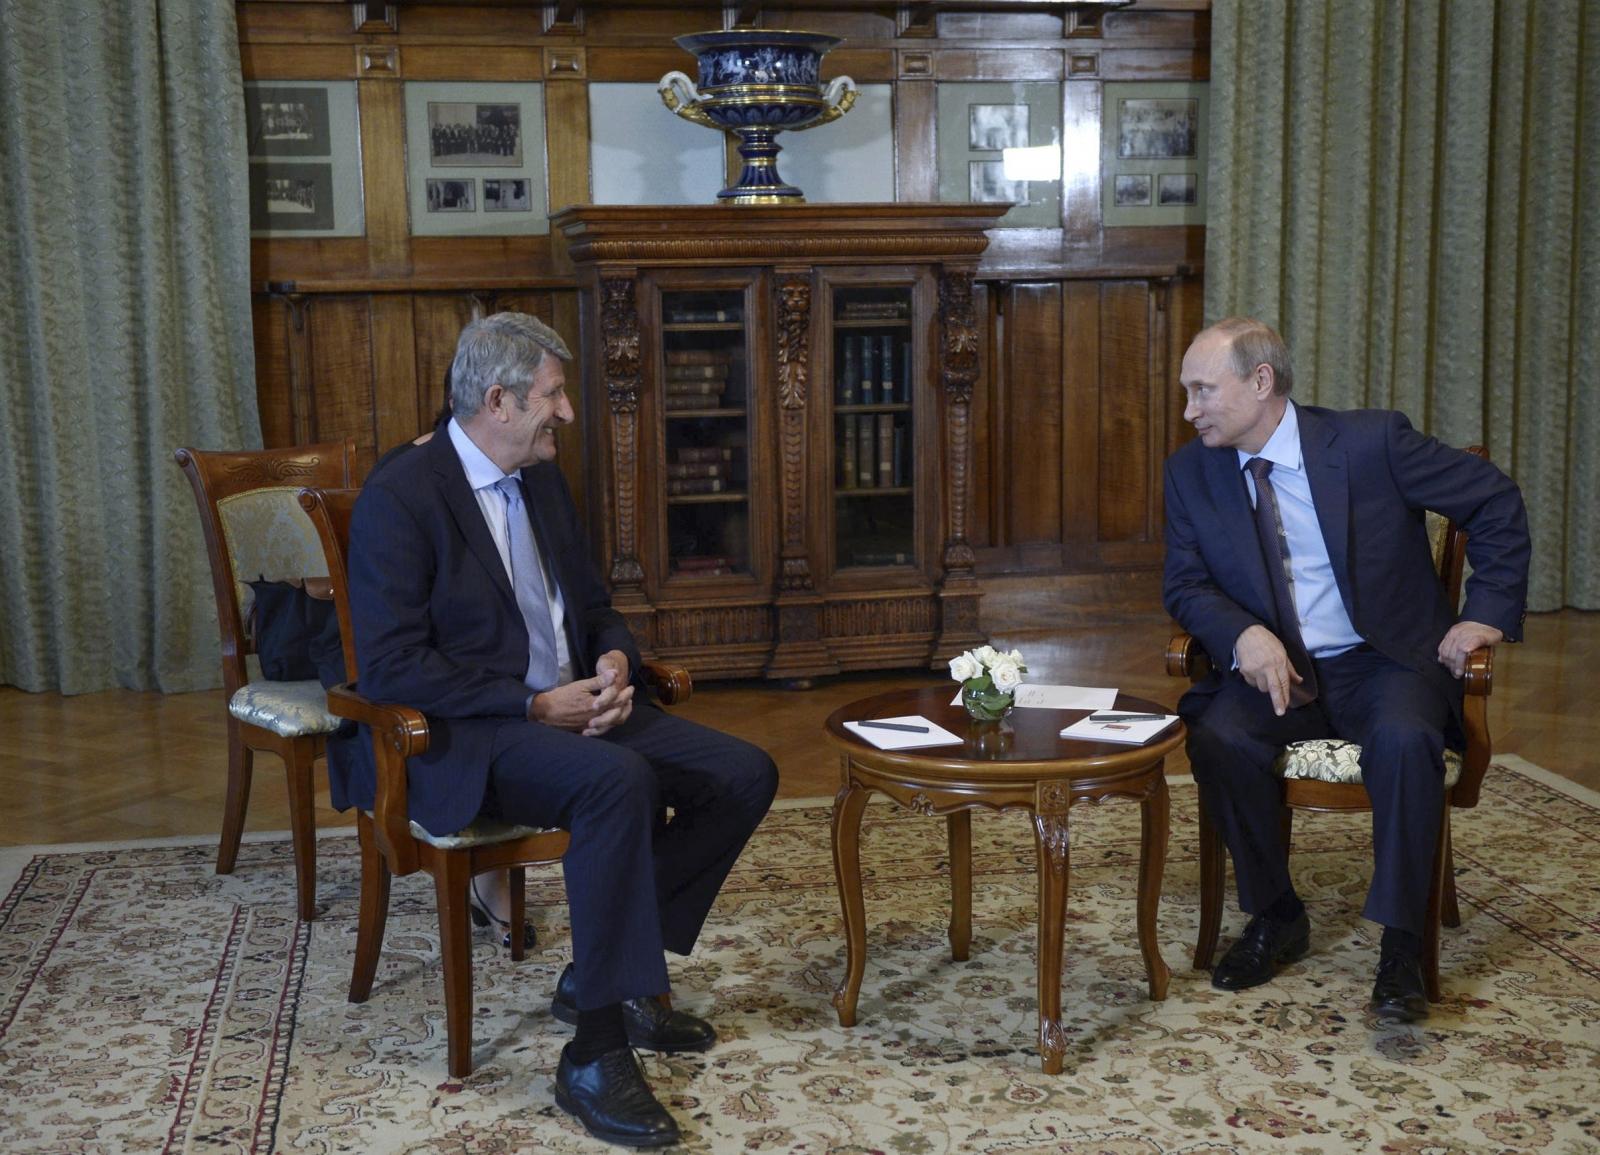 Russian President Vladimir Putin (R) meets with French businessman Philippe de Villiers in Yalta, Crimea,